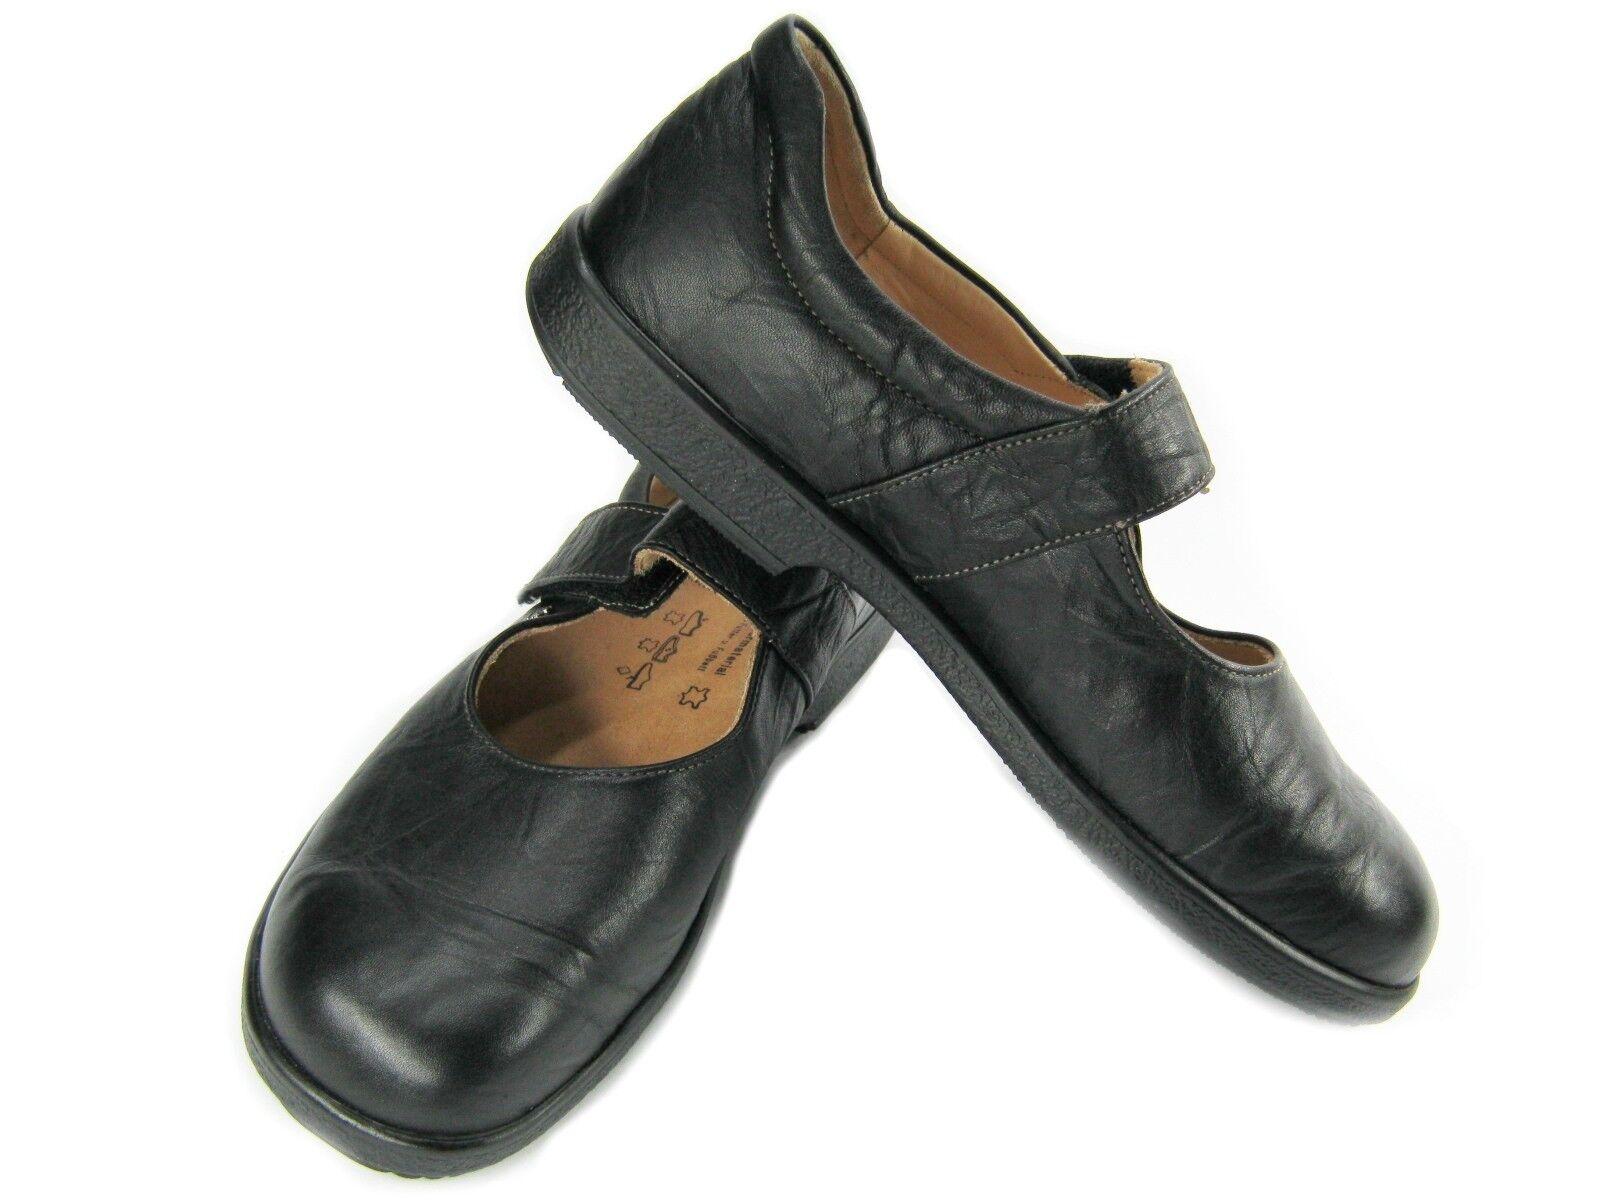 FINN COMFORT Womens Strap shoes Flats Clogs Black Size 9 40 Slip On  Mary Jane